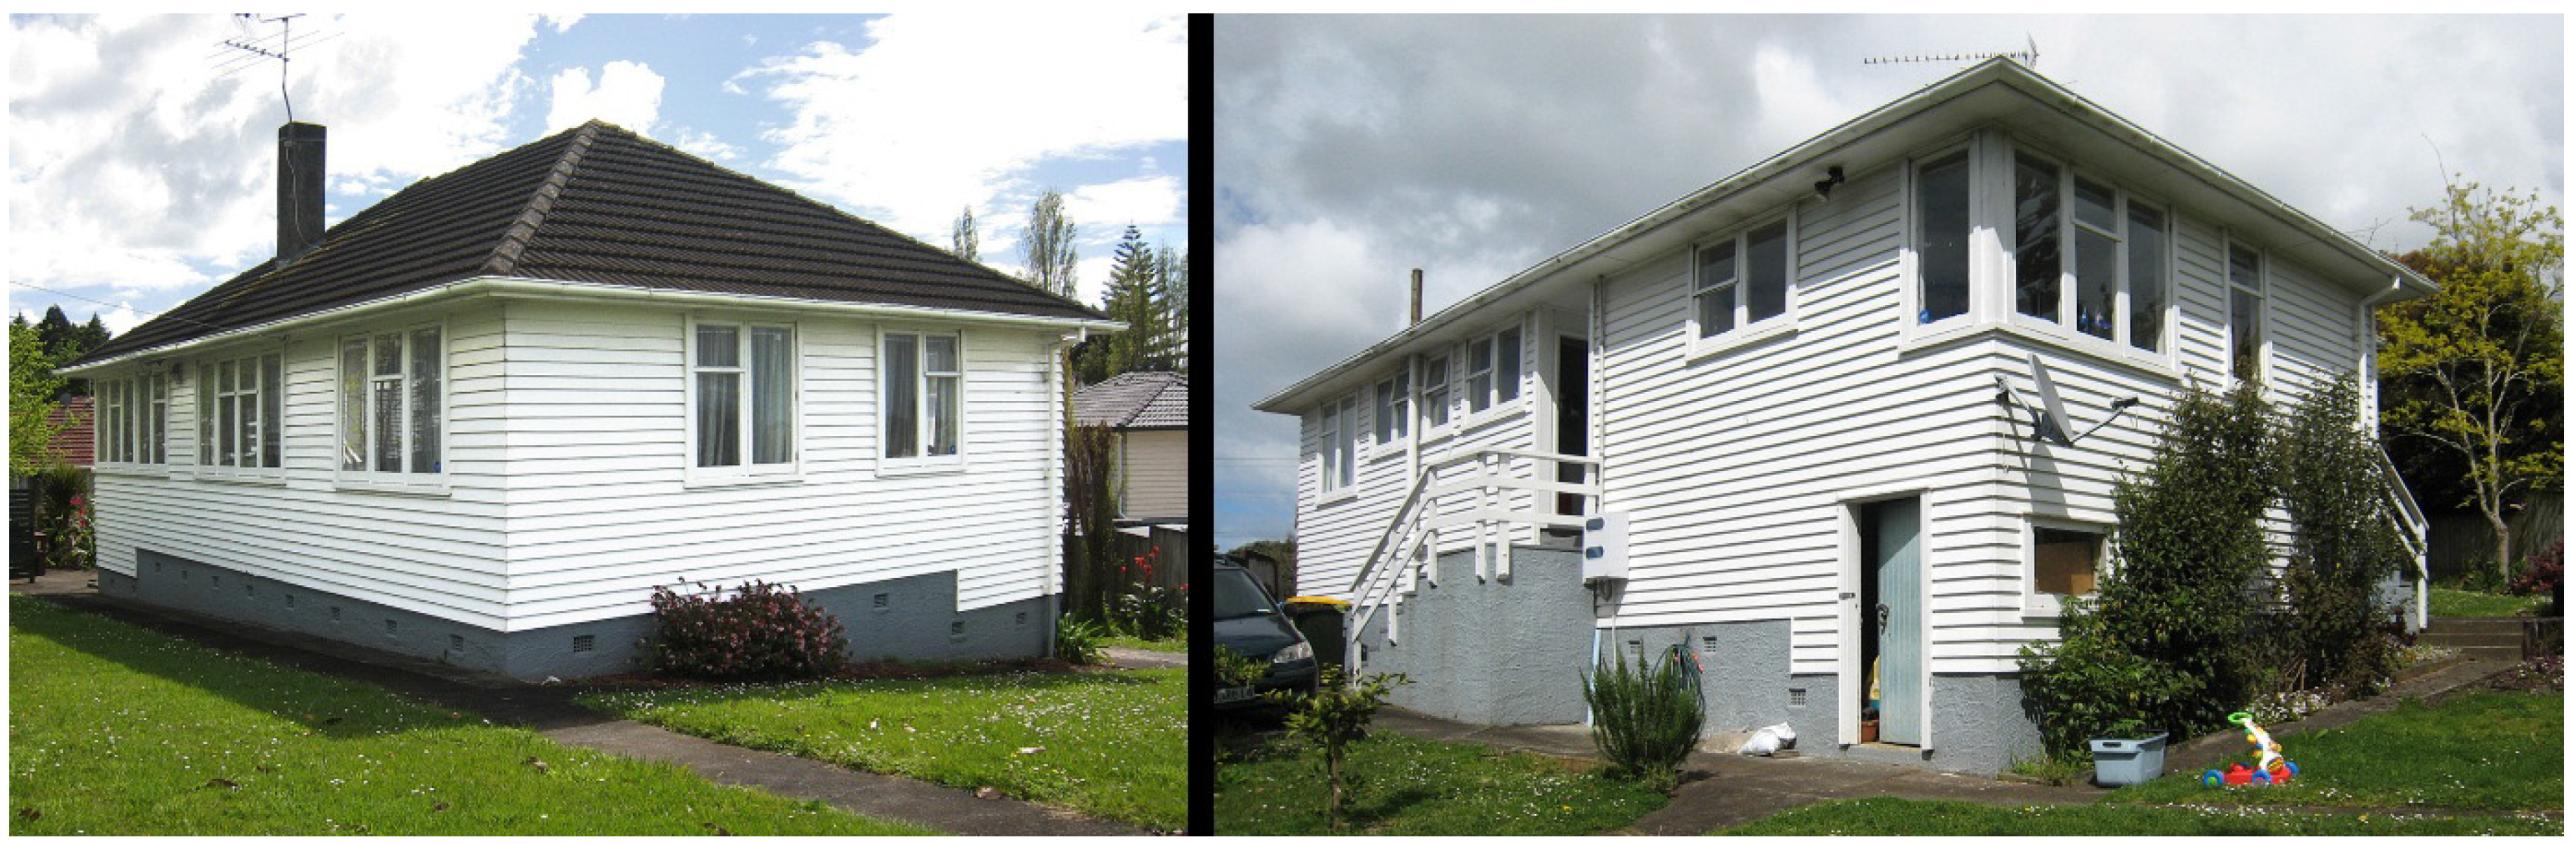 Buildings | Free Full-Text | Modern Housing Retrofit